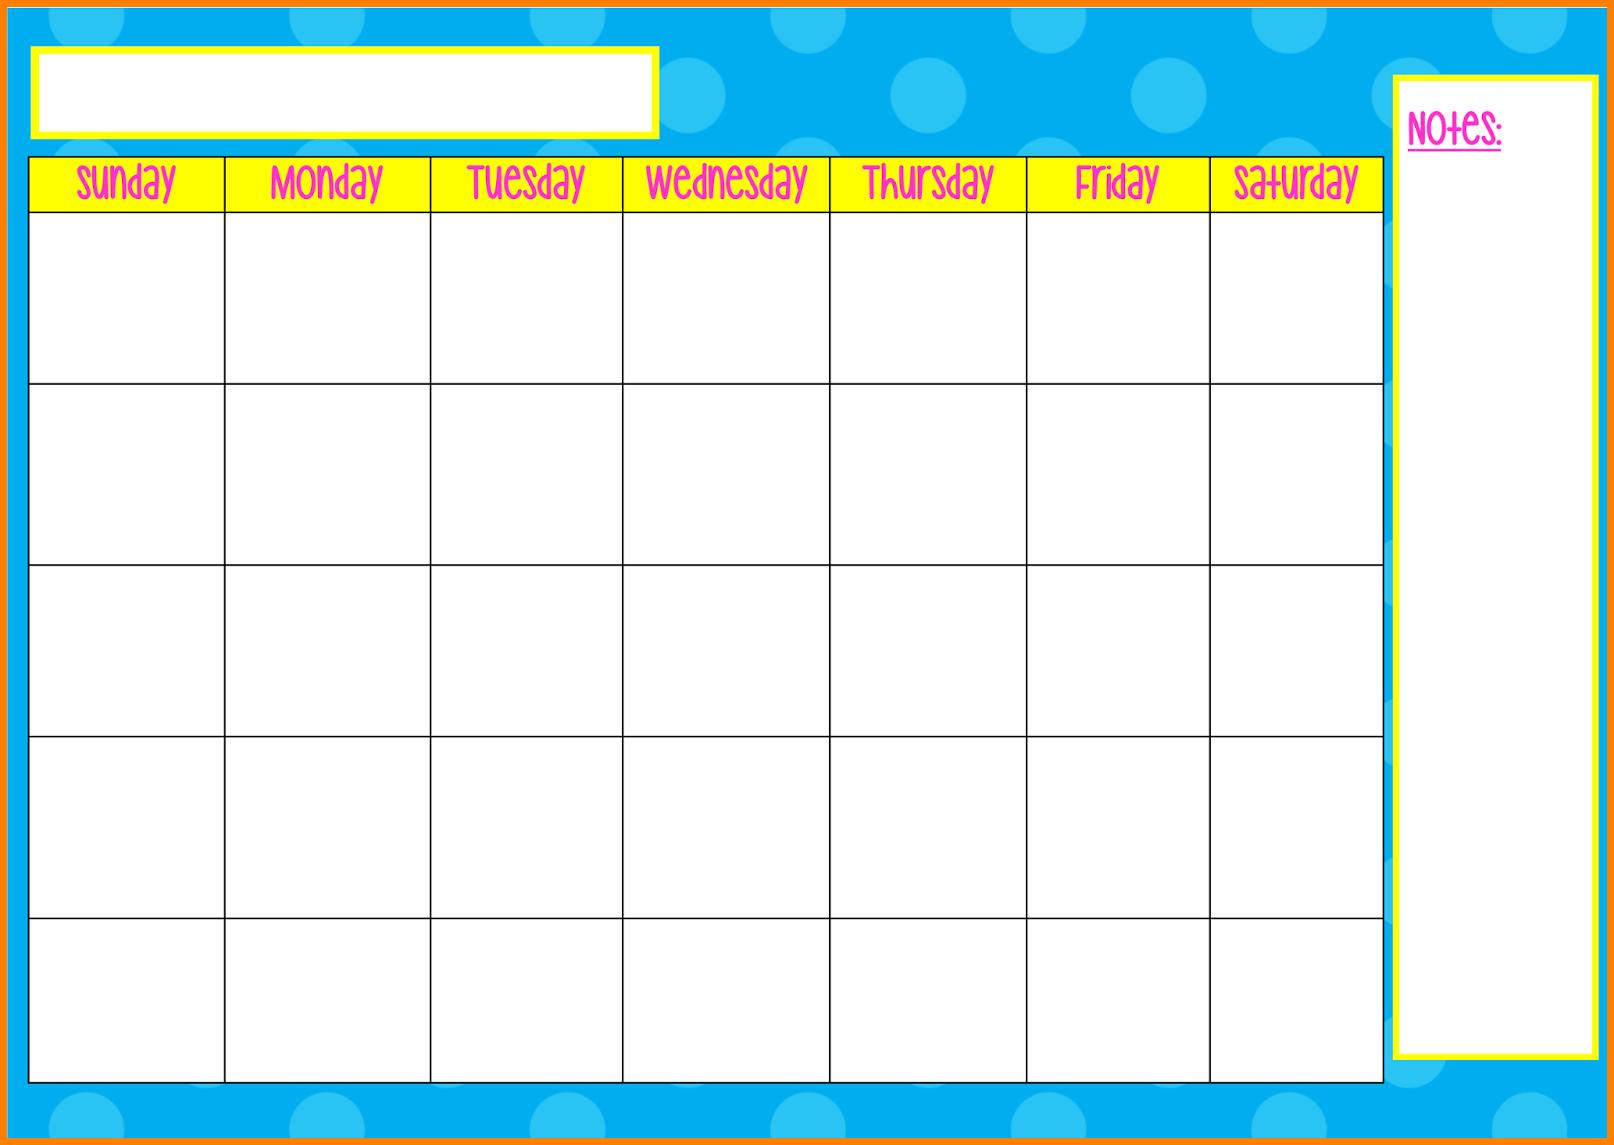 10+ Monday Thru Friday – Card Authorization 2017 Template Momday To Friday